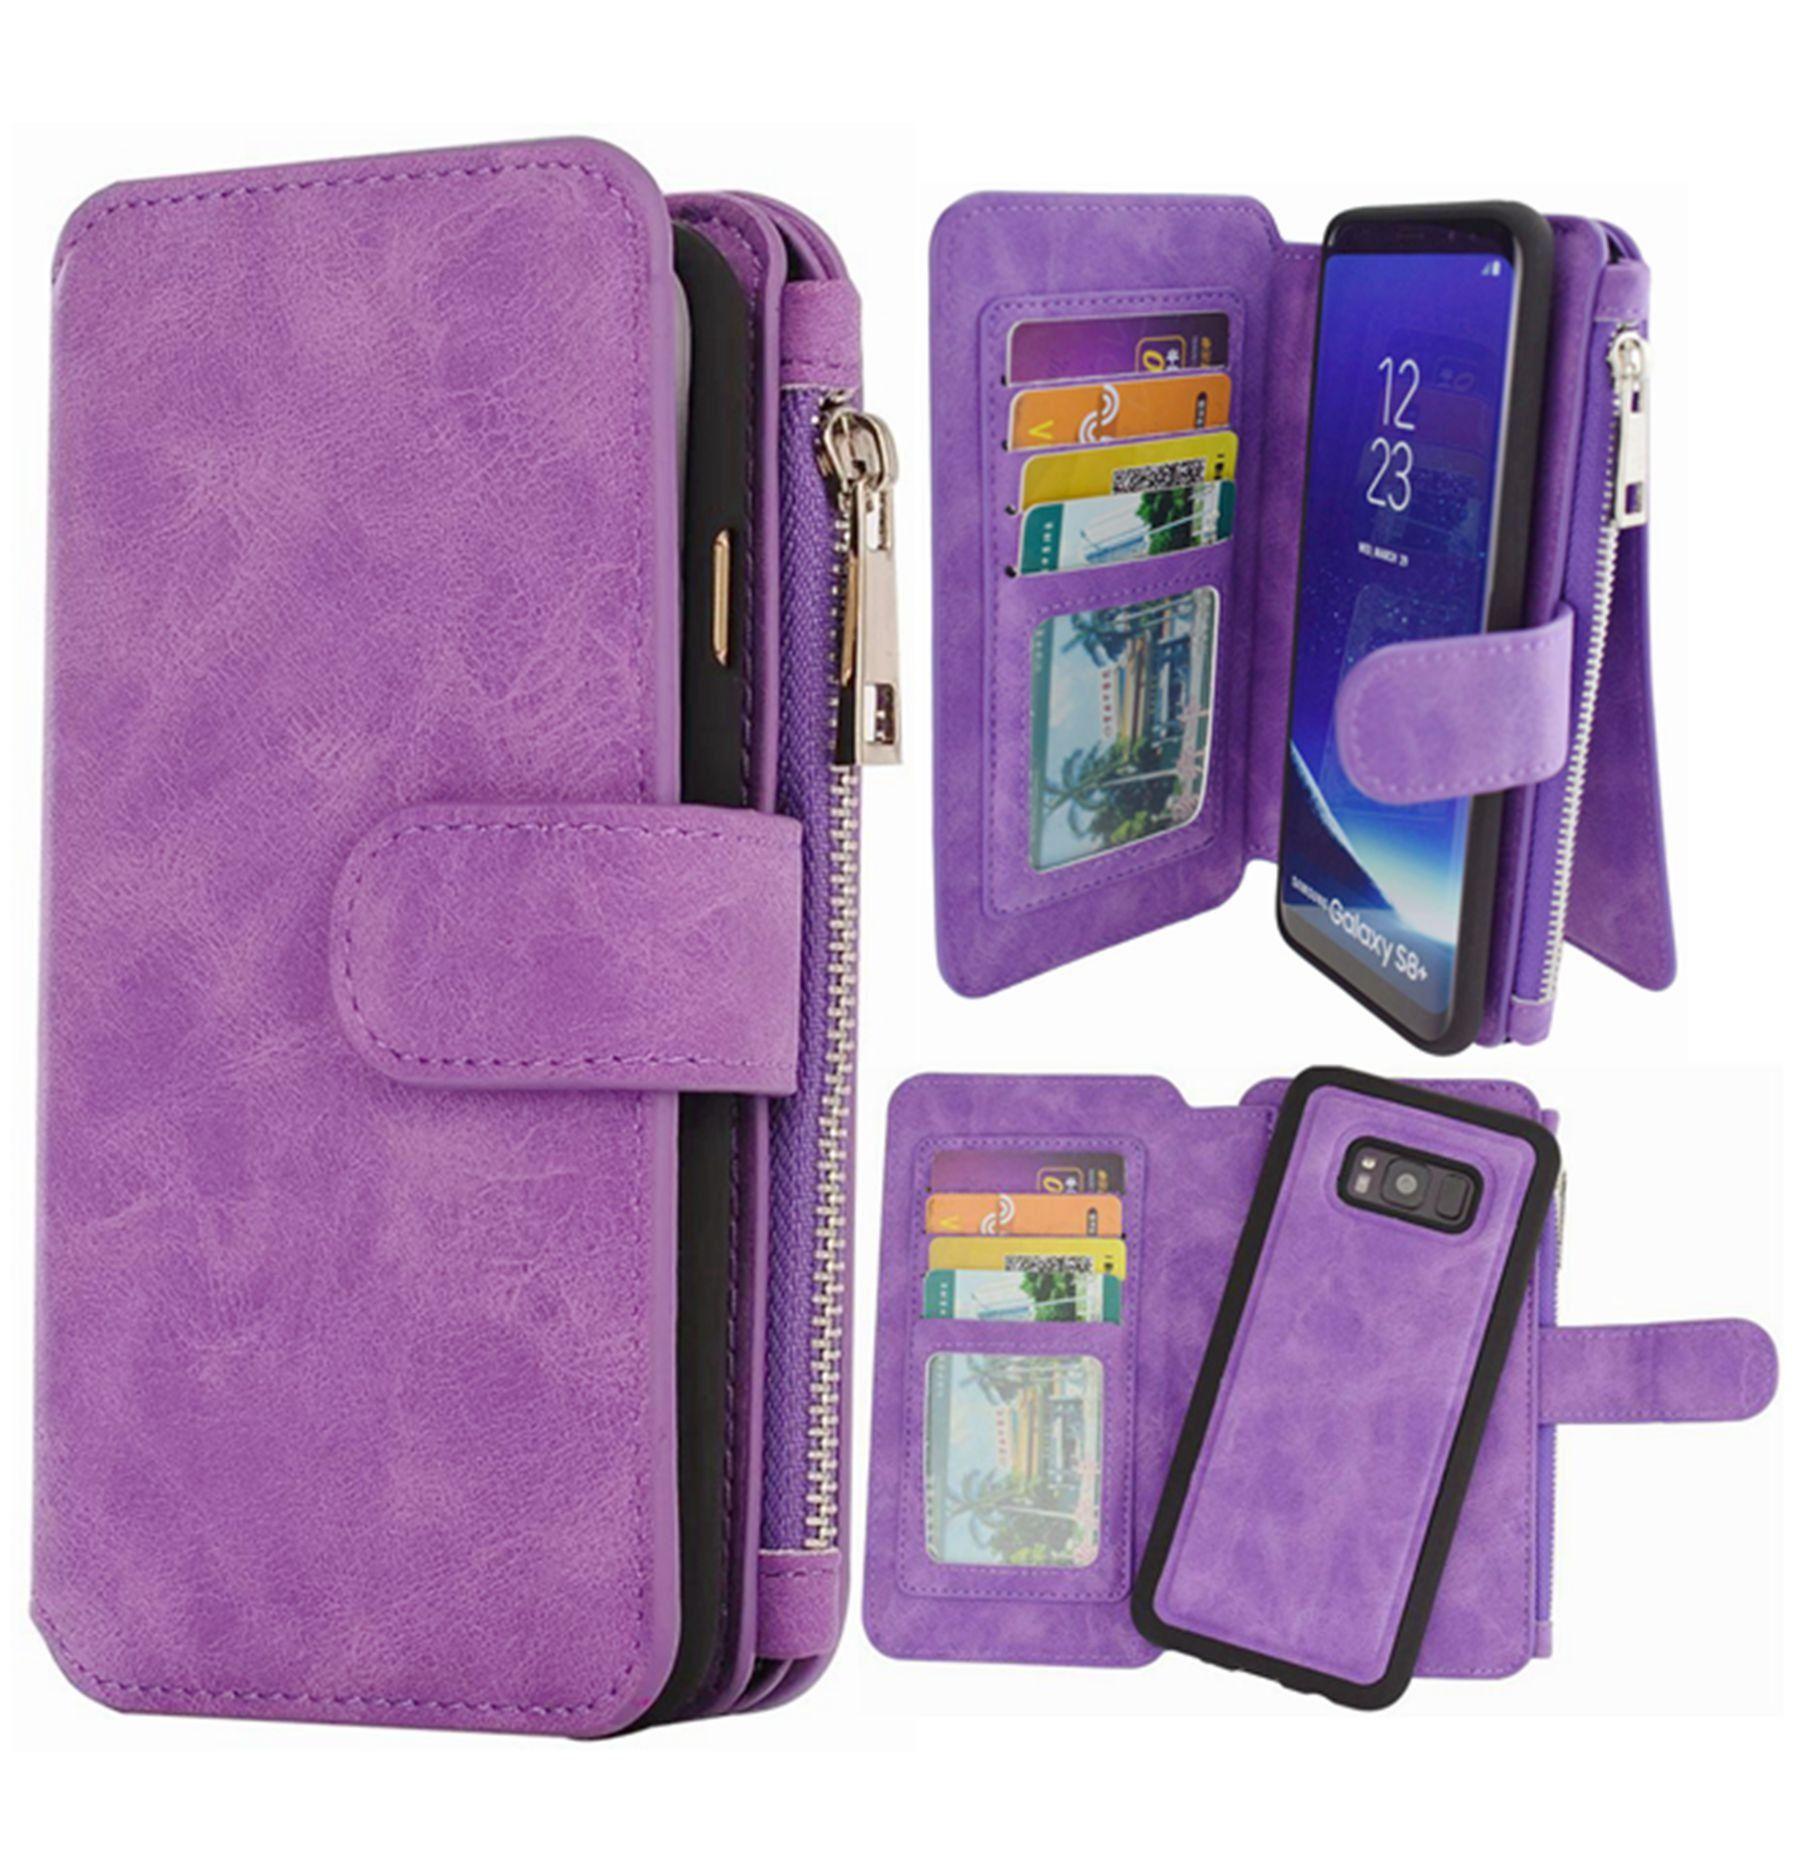 hynice s8 wallet case,galaxy s8 case pu leather detachable magnetichynice s8 wallet case,galaxy s8 case pu leather detachable magnetic with 14 flip card